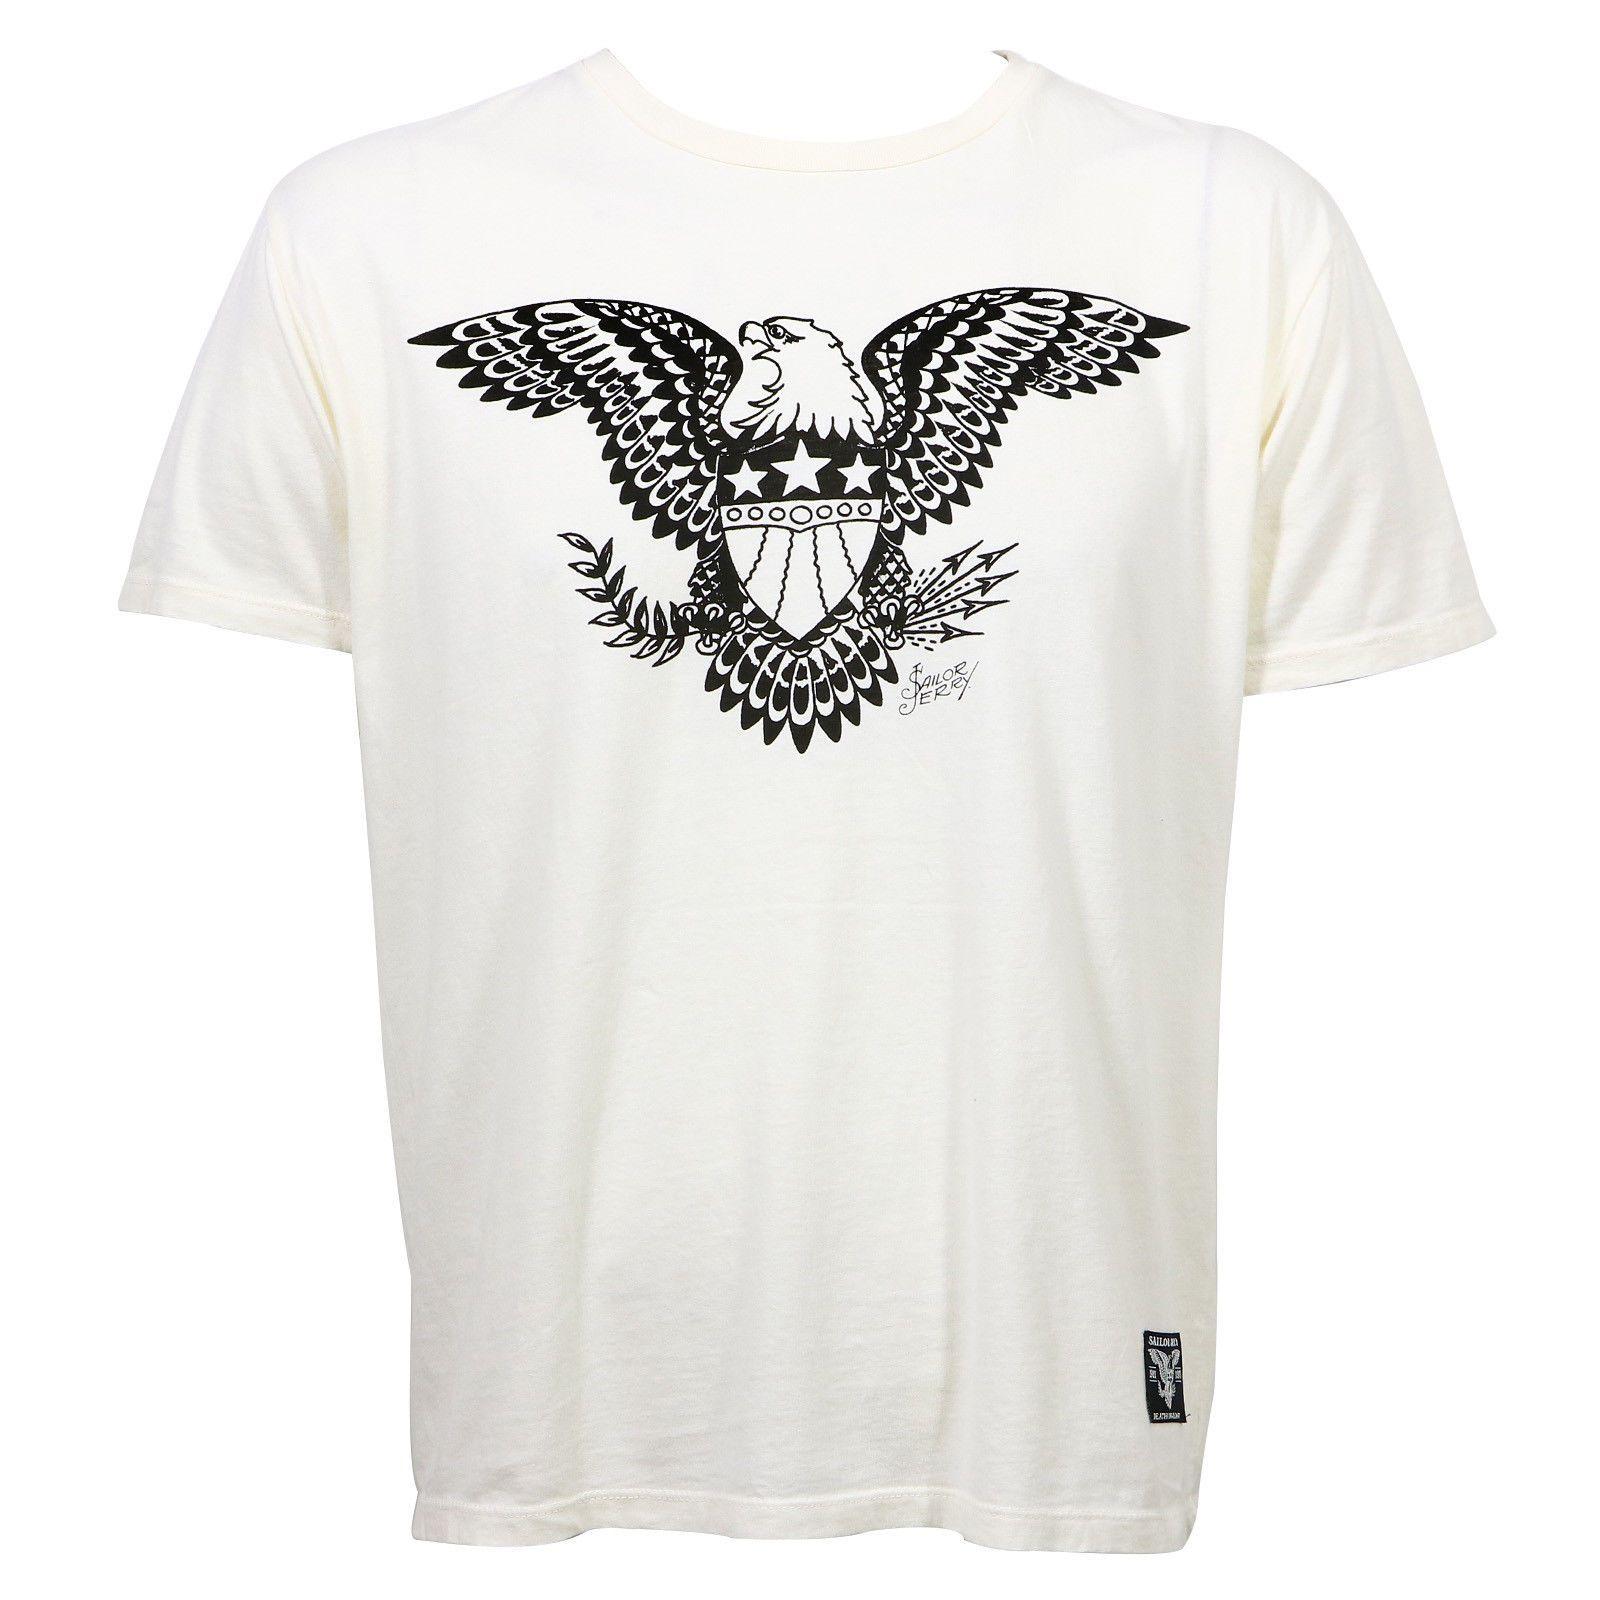 ca29893dd Sailor Jerry Tattoo Bars Stars & Eagle Slim Fit T Shirt White S 2Xl New T  Shirt Men Digital Direct Printing White Short Sleeve With T Shirt T Shirts  ...